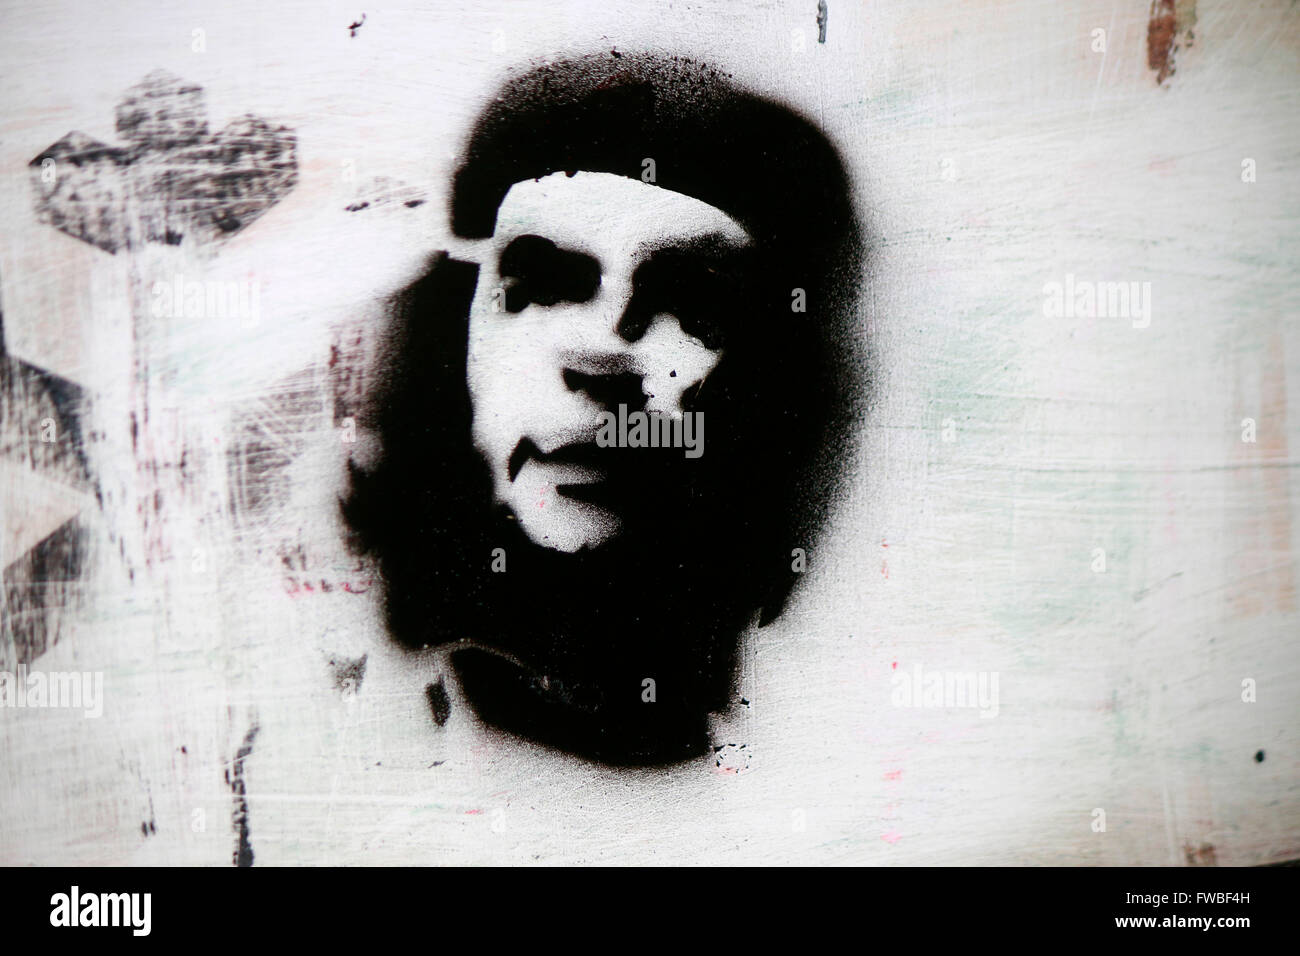 Ein Che-Guevara-Graffiti, Berlin. Stockbild